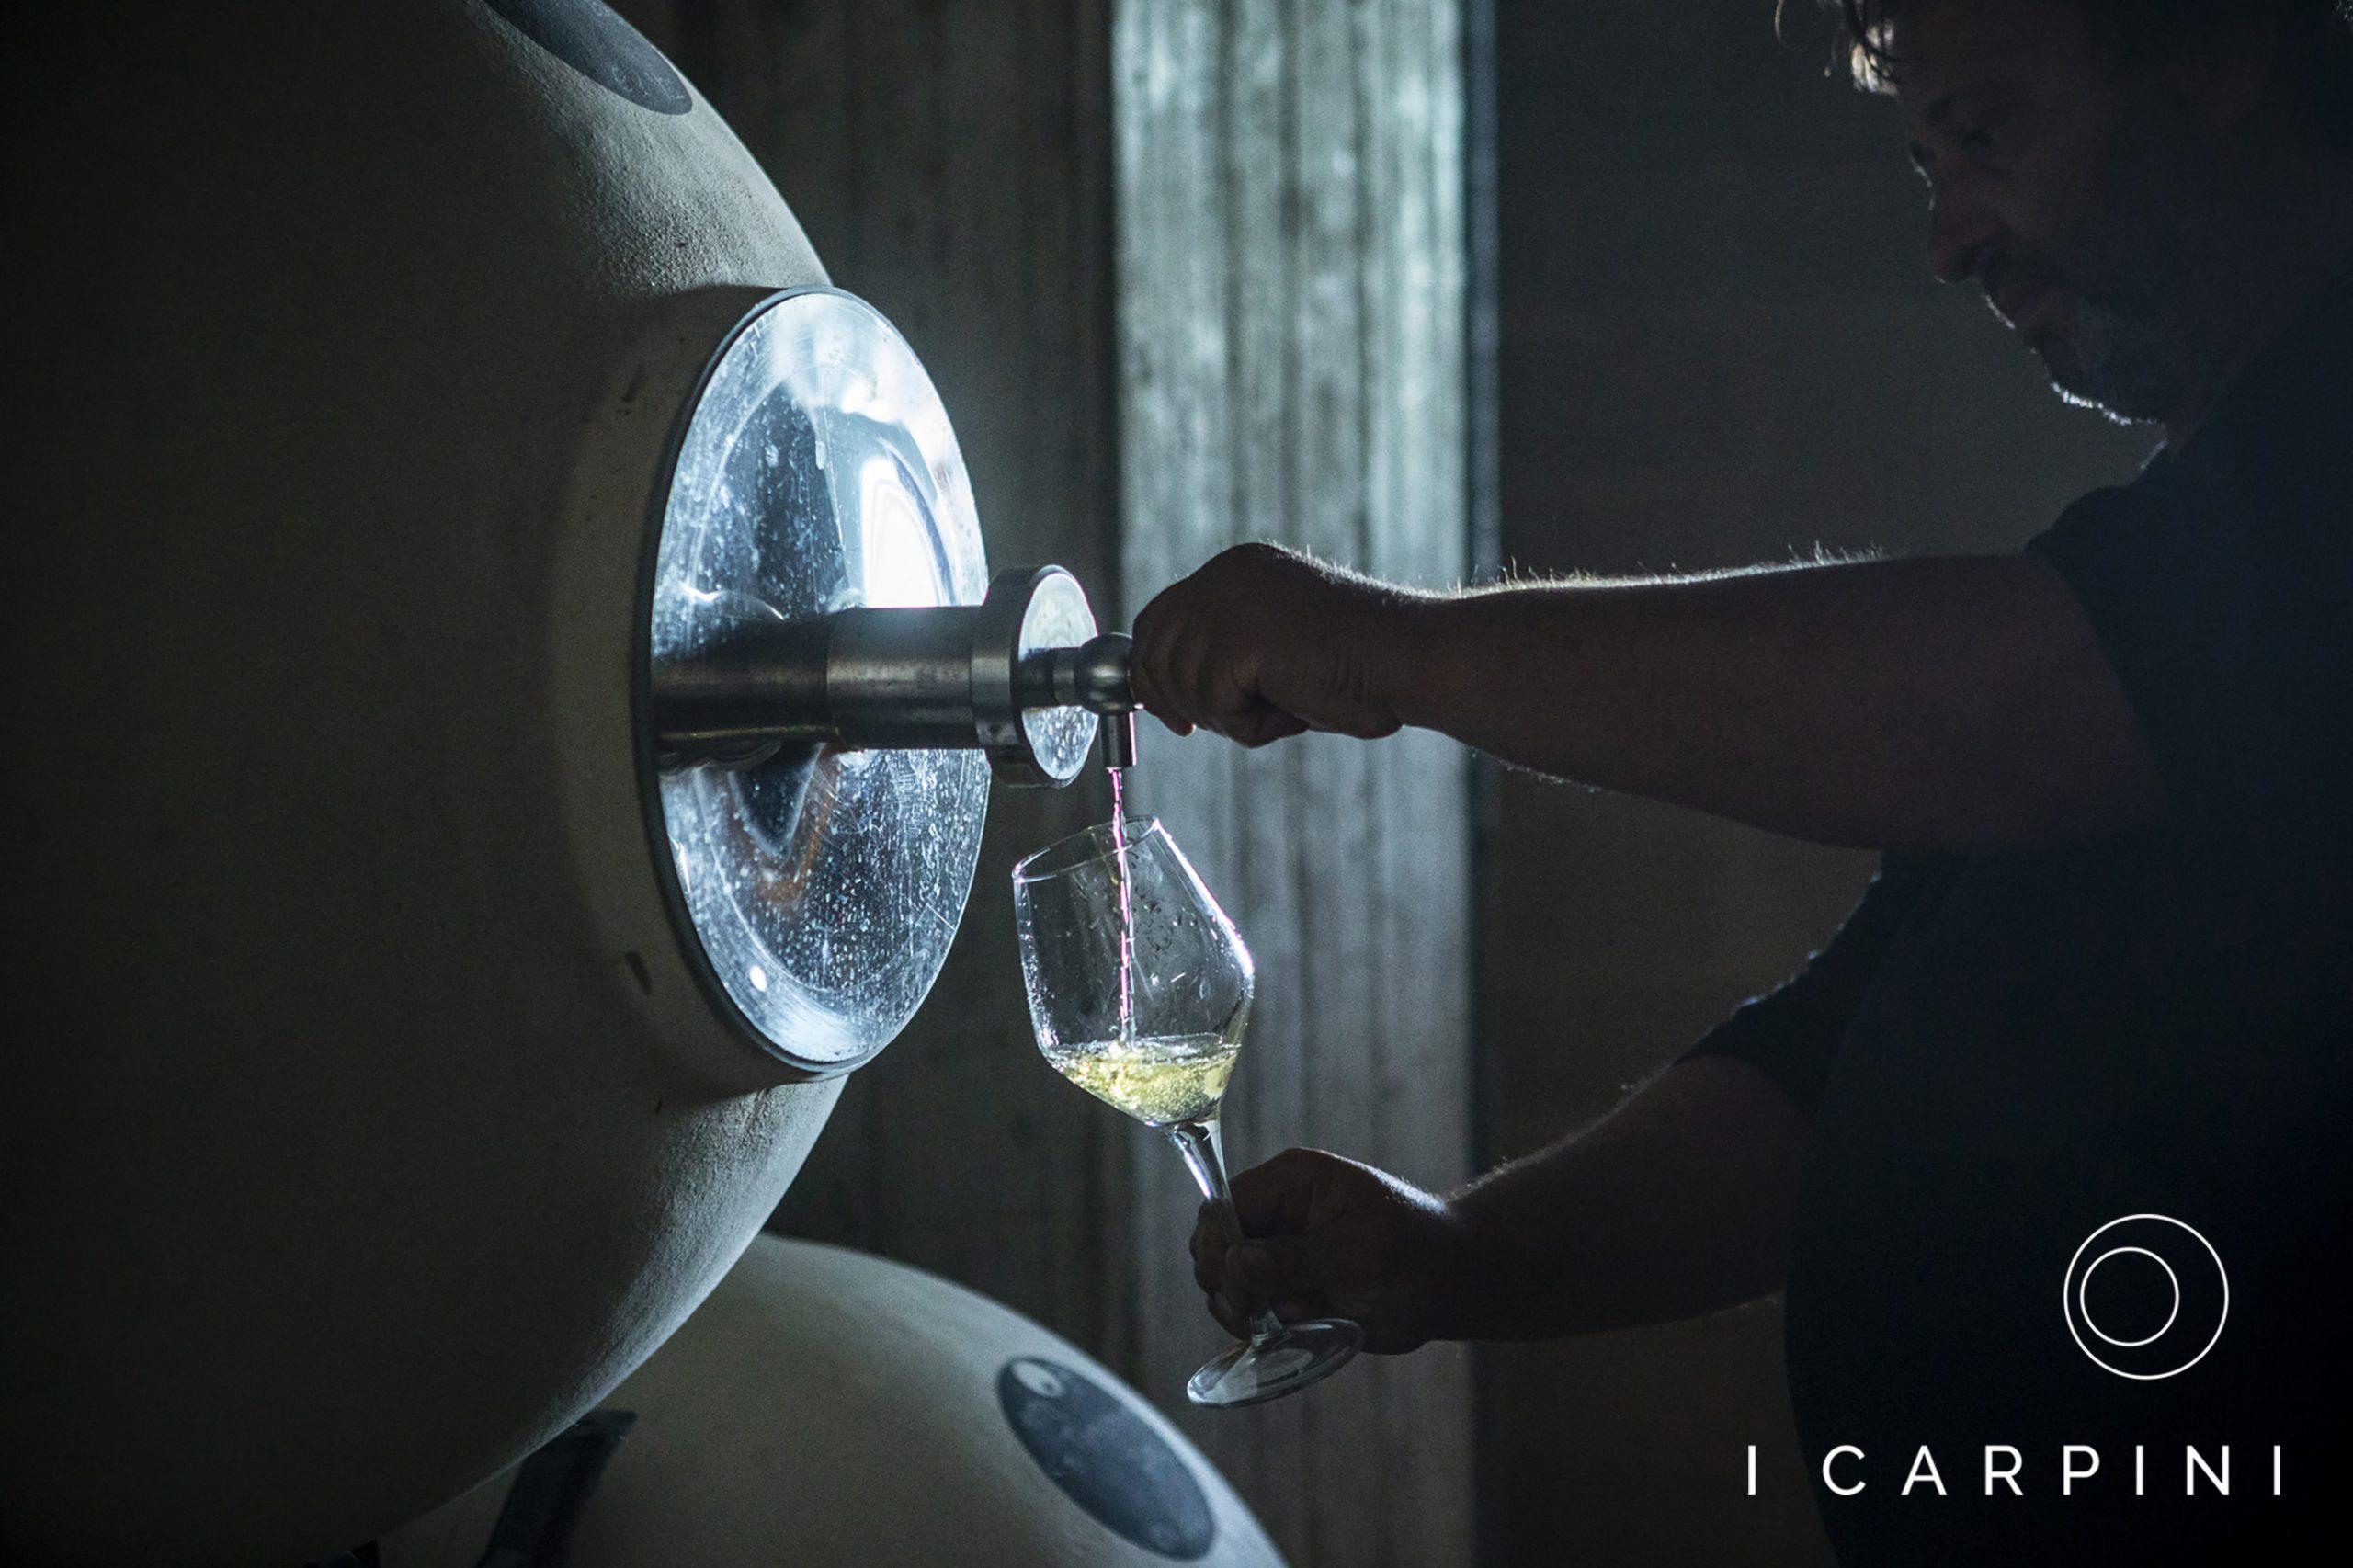 Cascina I Carpini_white wine tasting